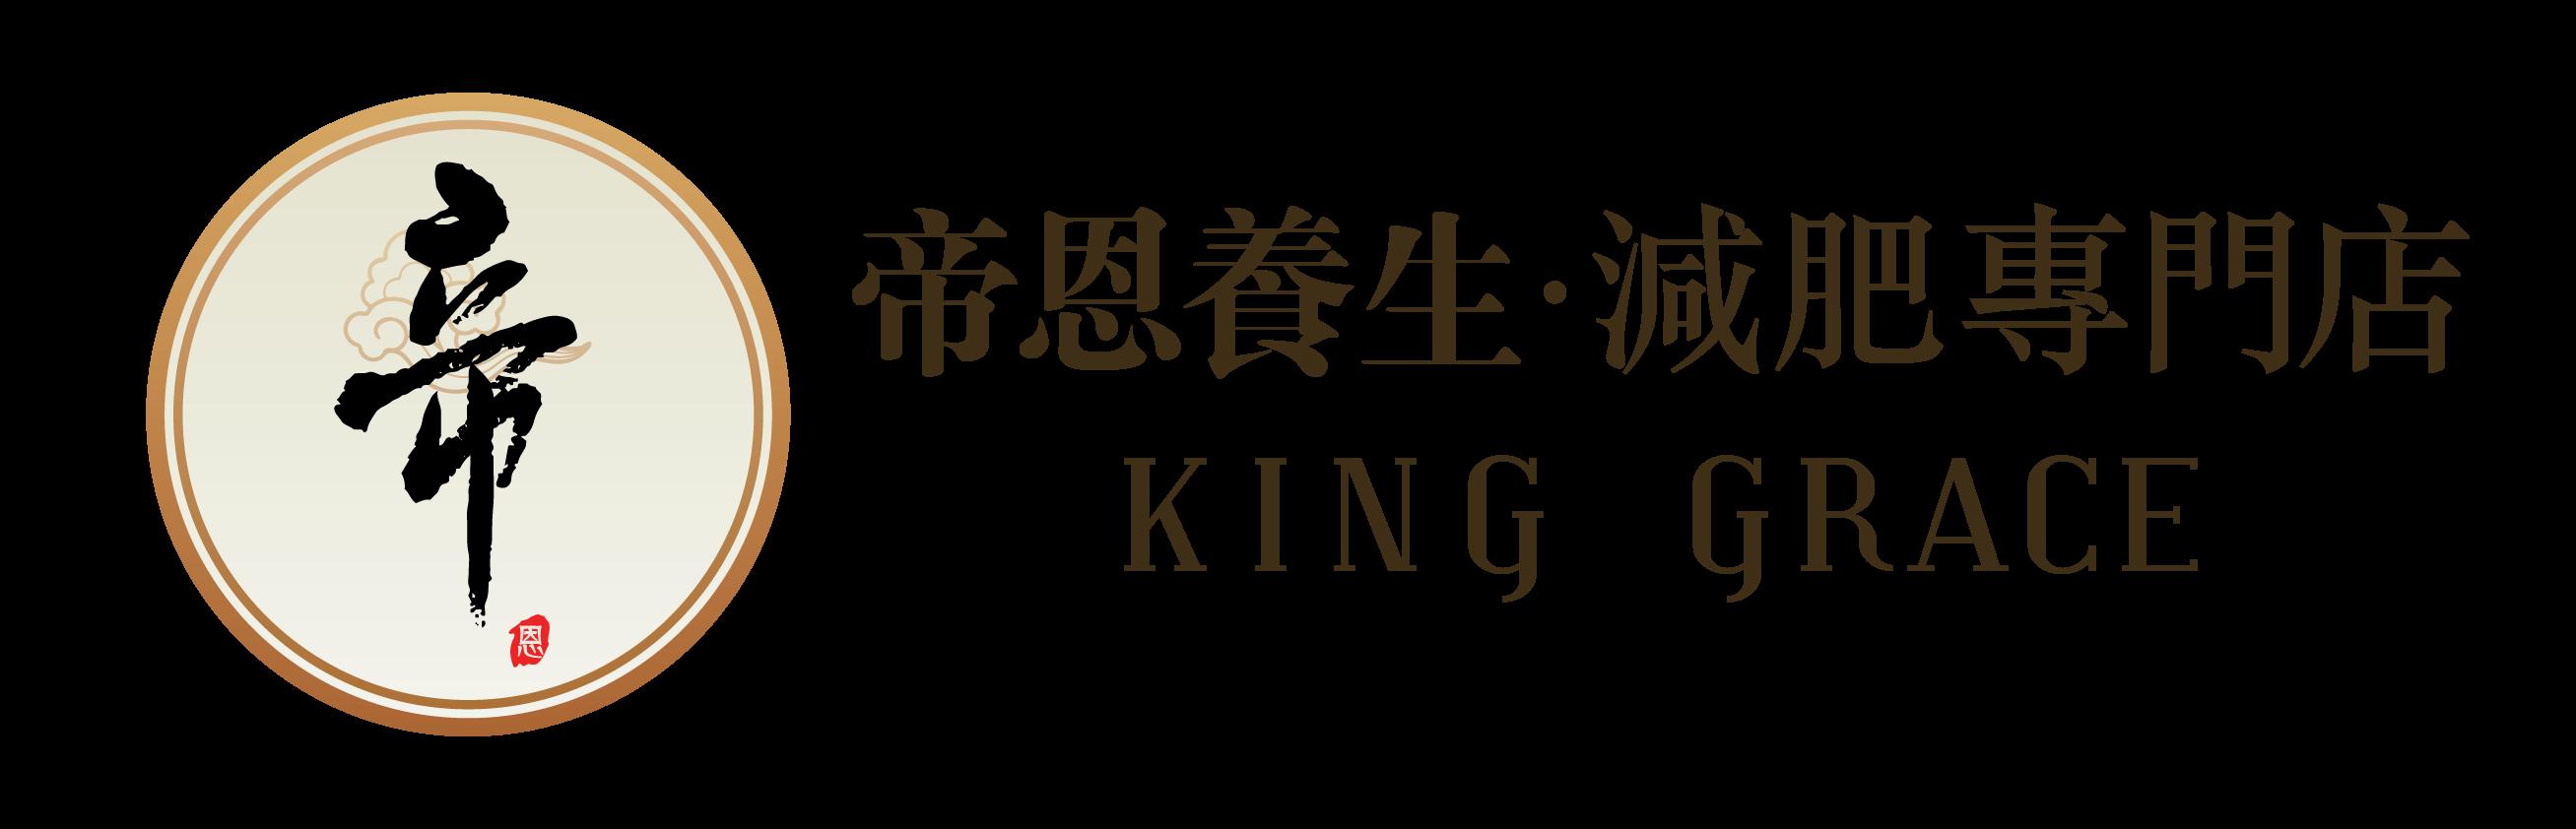 King Grace